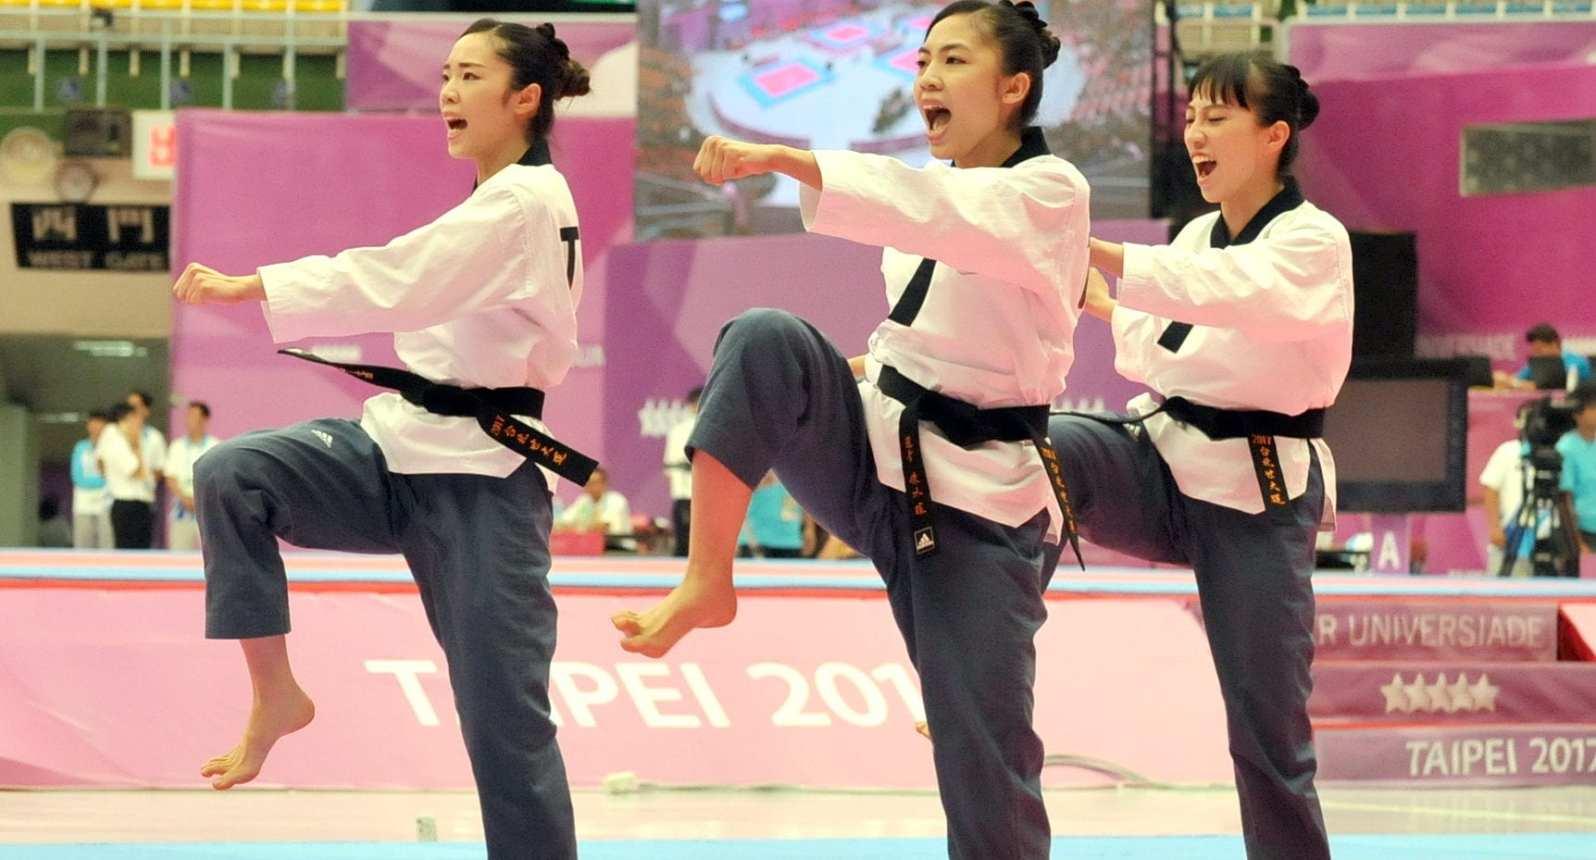 taiwan sexism